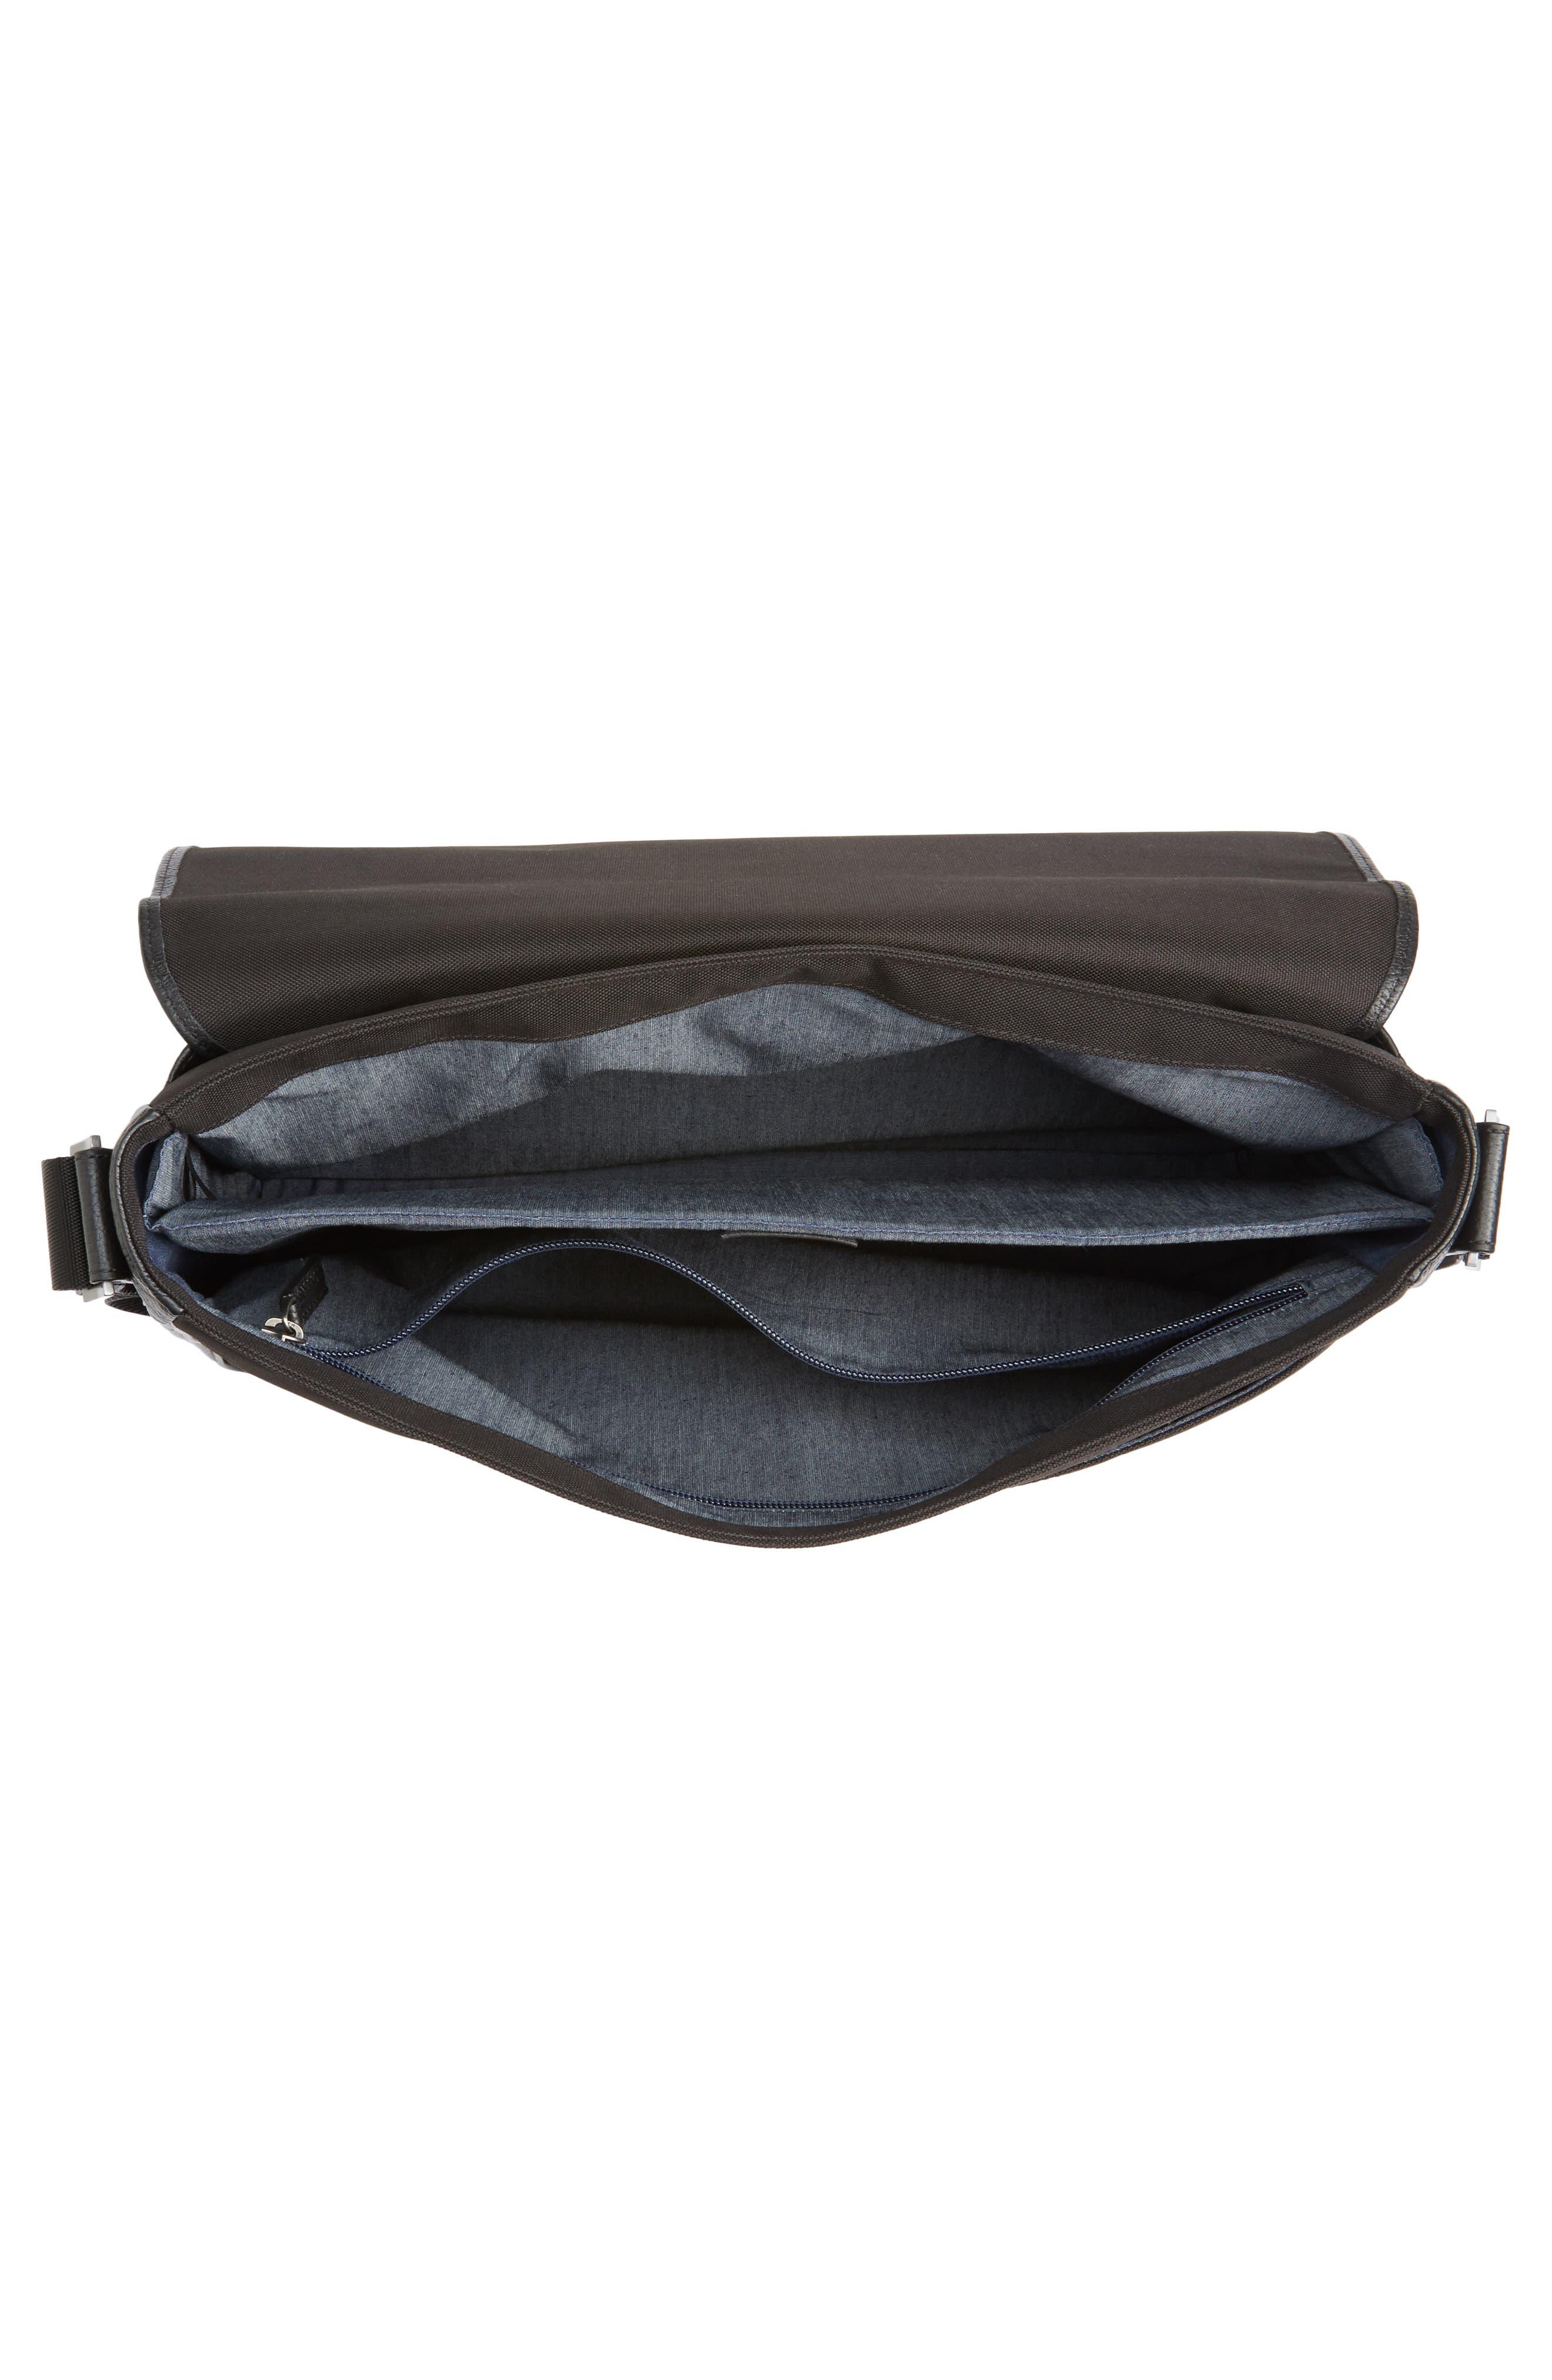 Midland Leather Messenger Bag,                             Alternate thumbnail 4, color,                             001